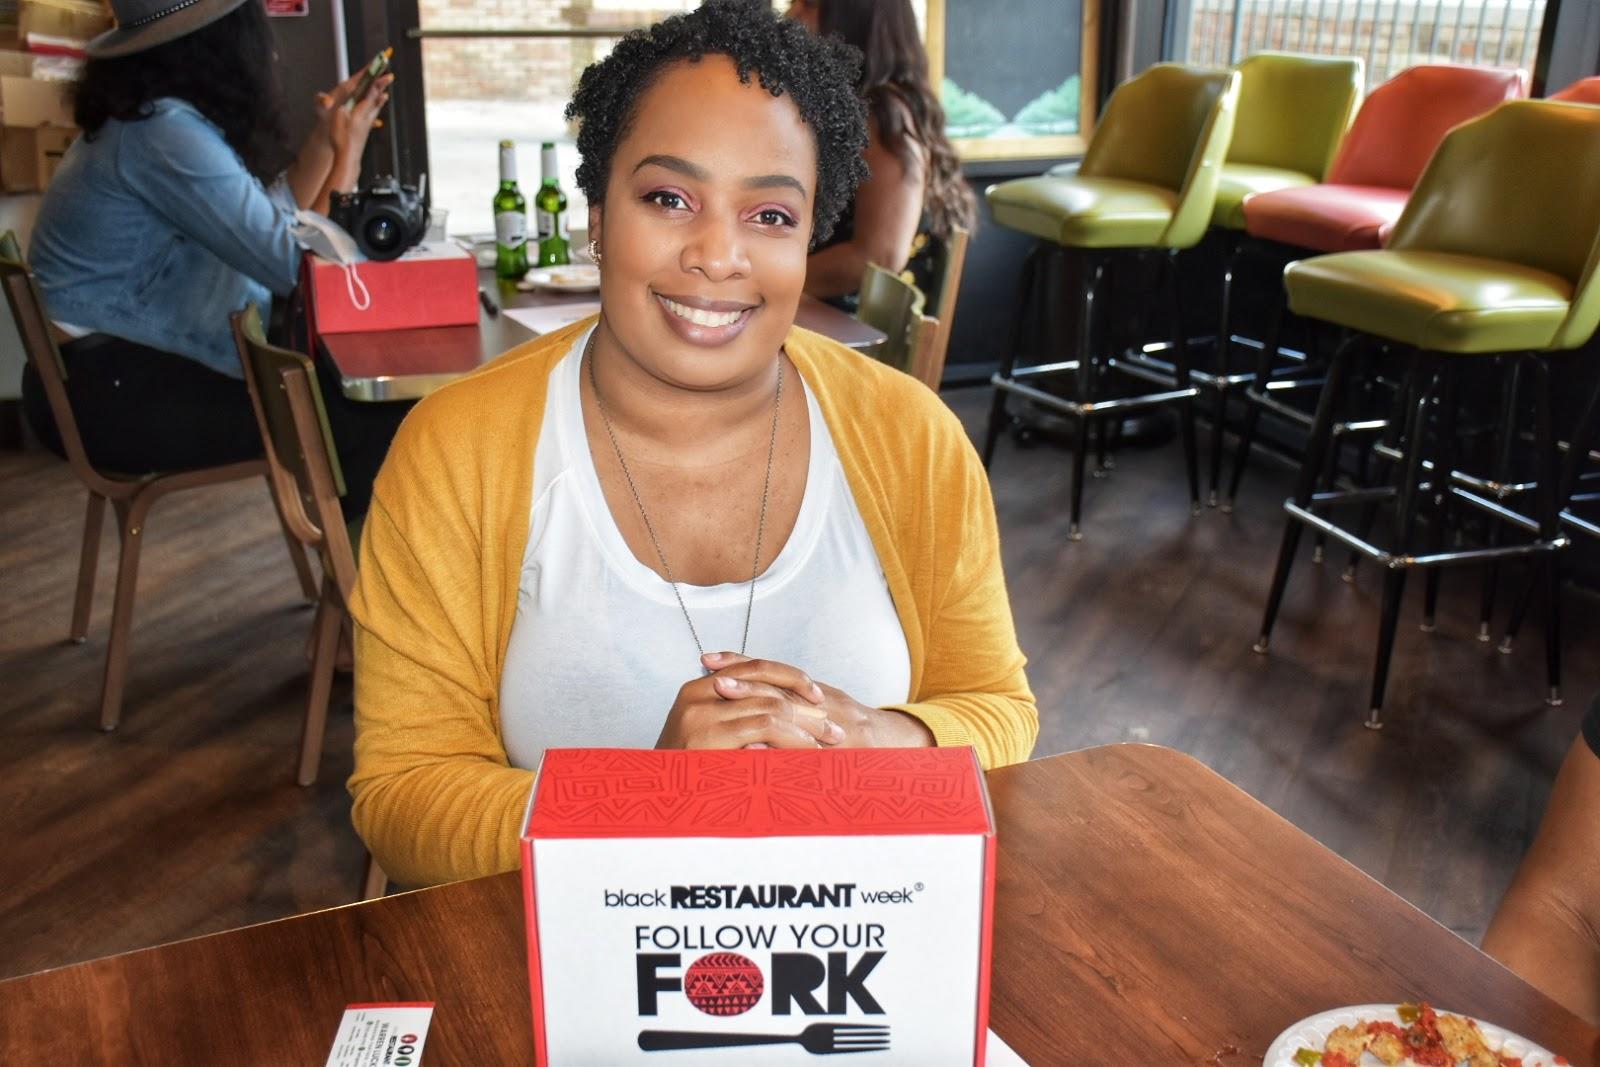 Celebrating Black Restaurant Week at Nancy's Pizzeria in Dunwoody, Georgia